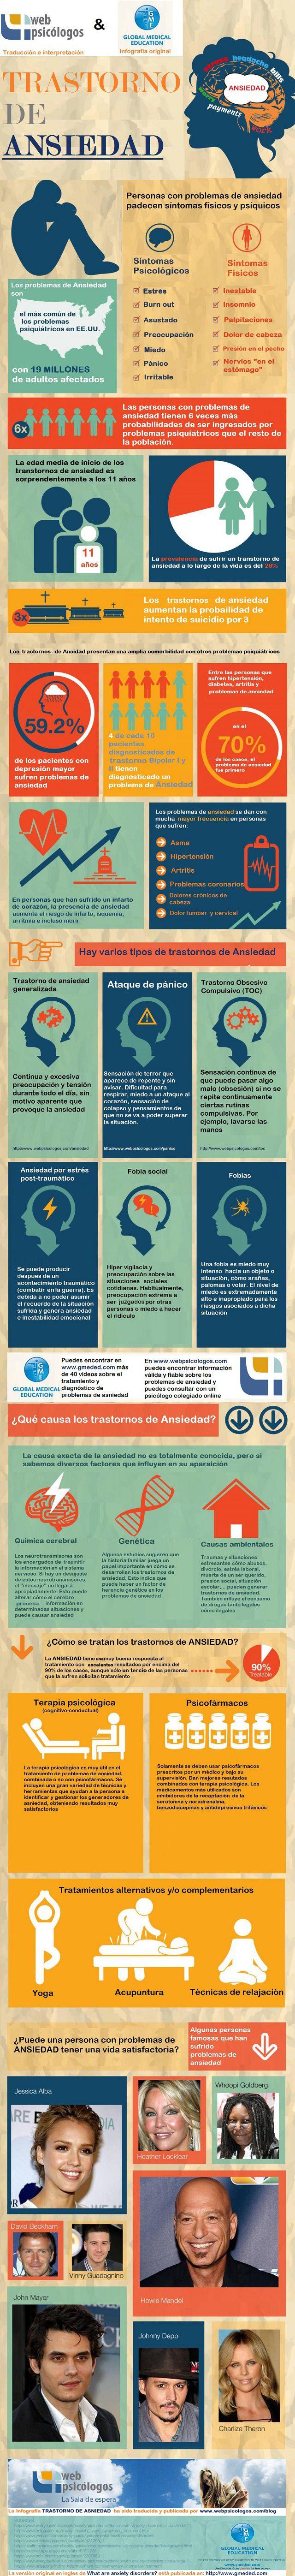 Trastorno de #ansiedad http://www.pinterest.com/alimenbienestar/infograf%C3%ADas-salud-y-bienestar/